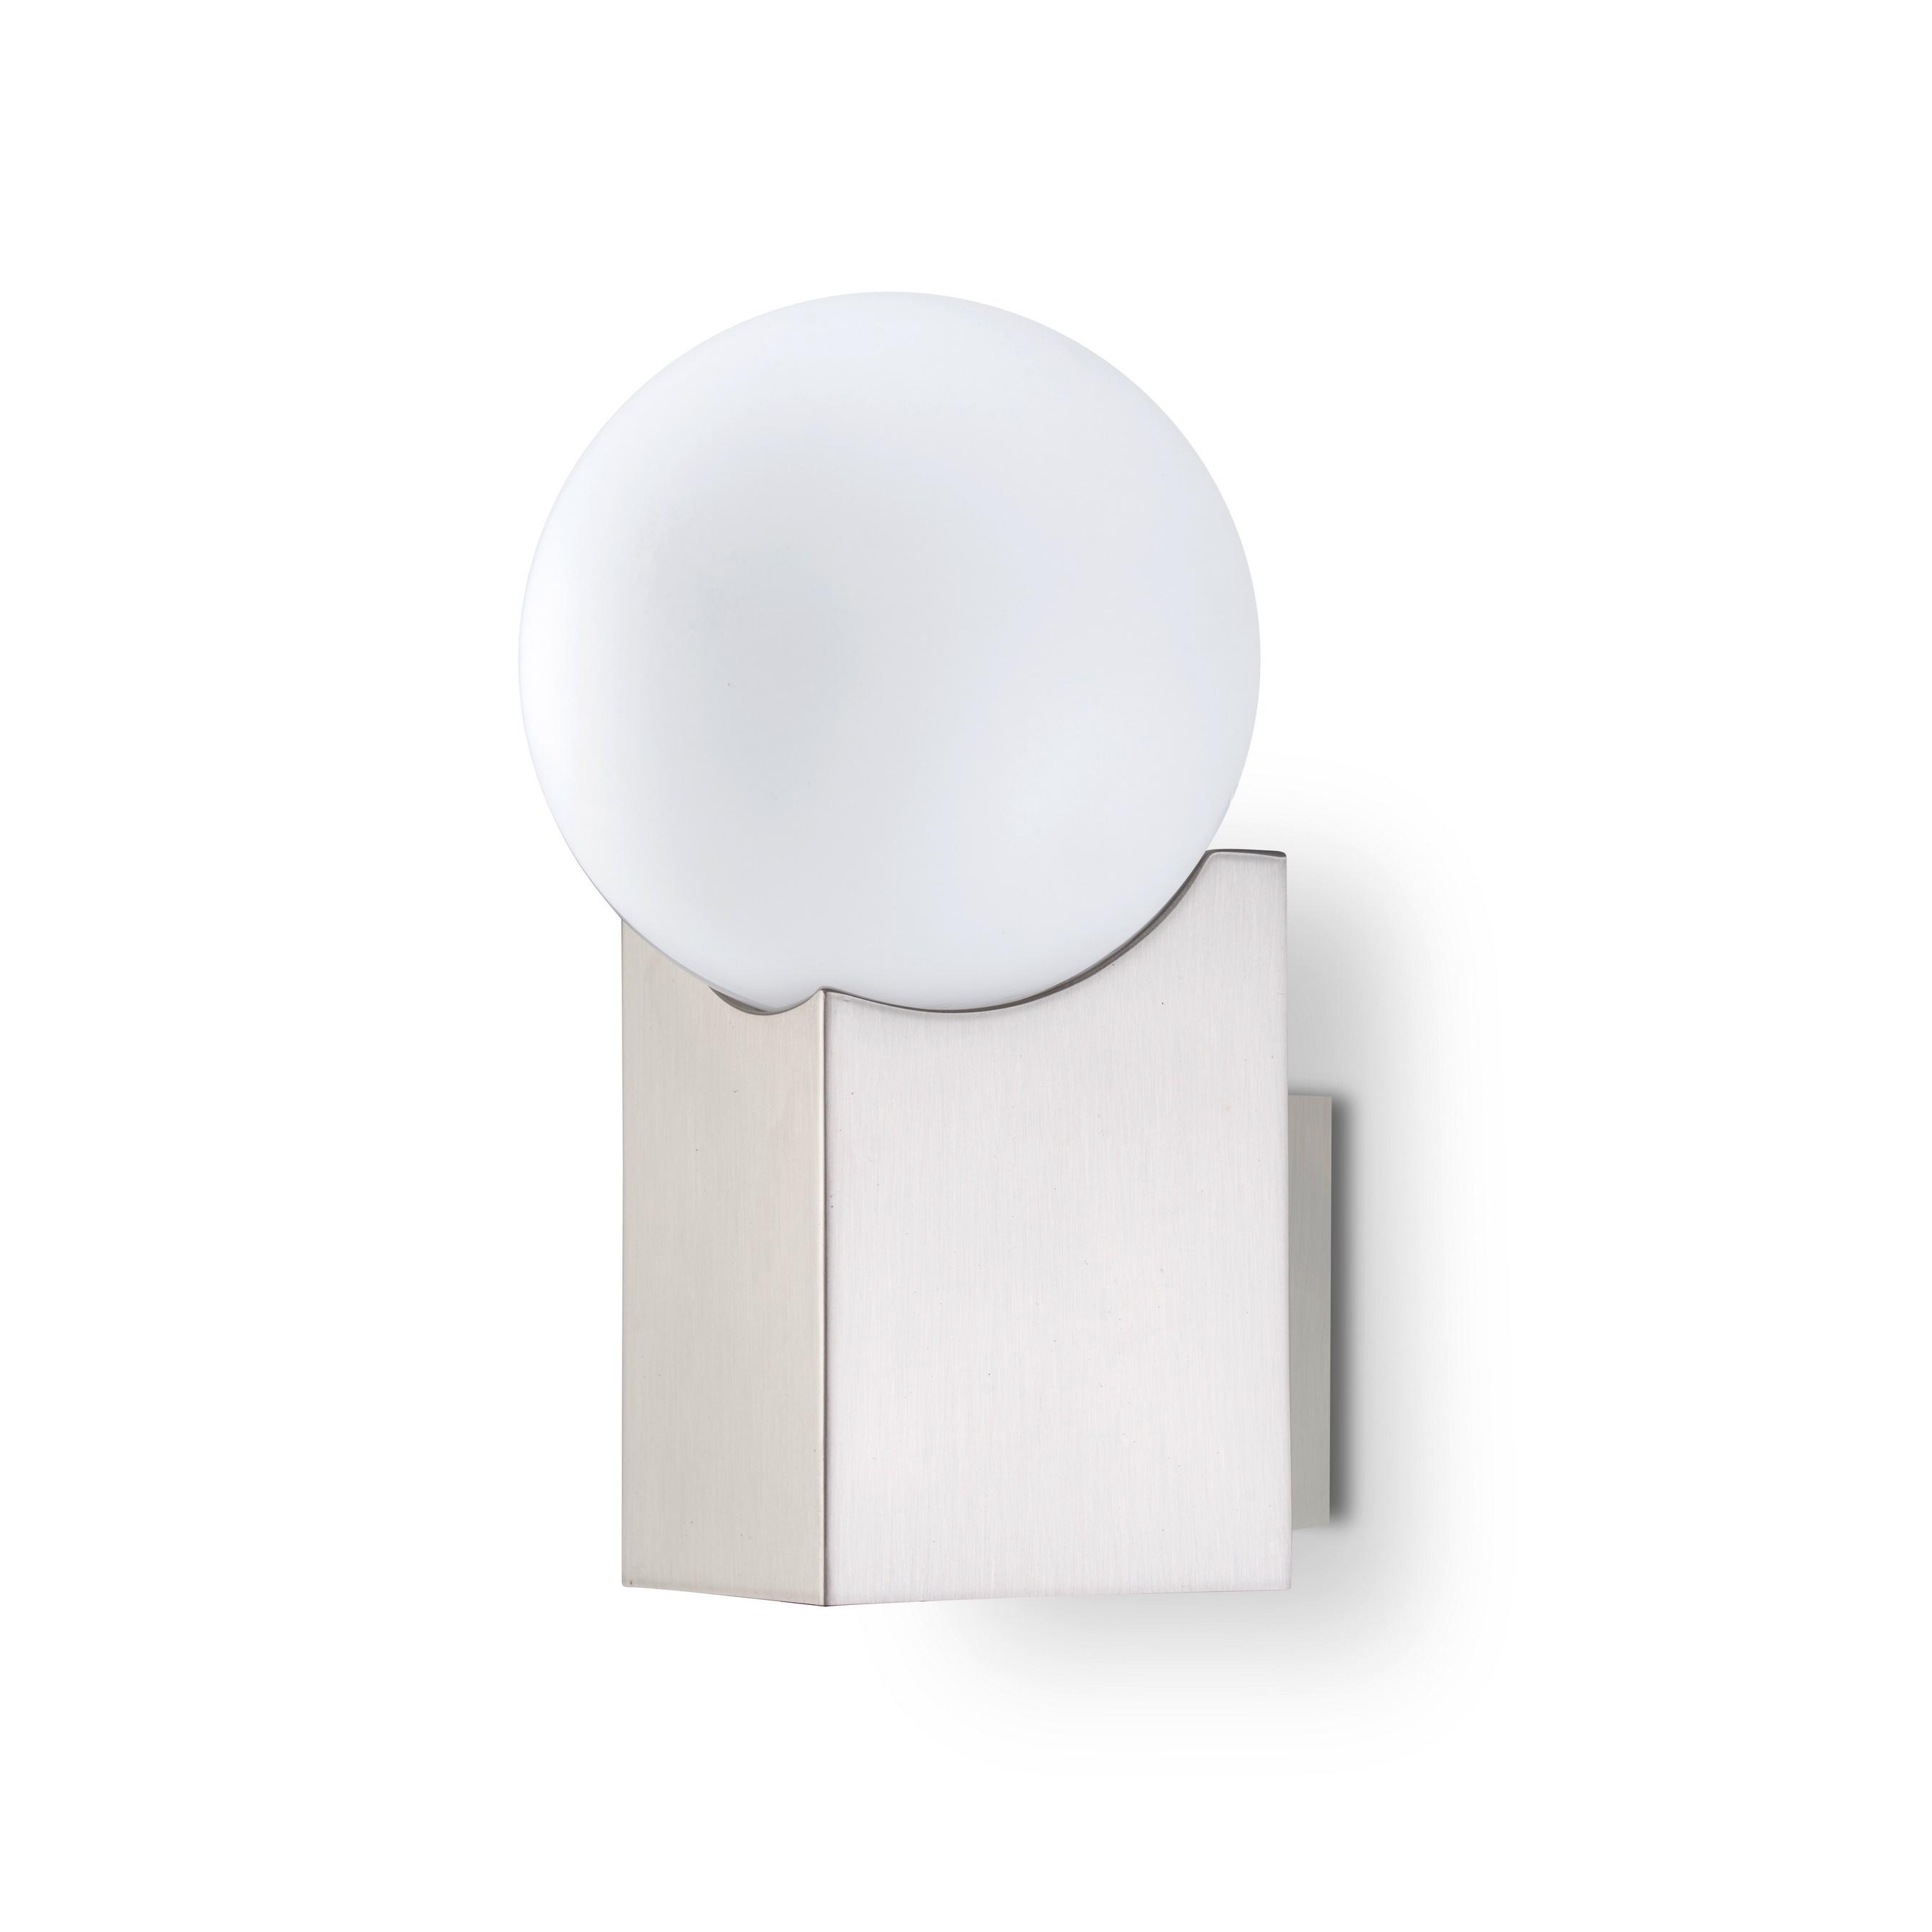 Cub Aplique G-9 LED Acero y cristal 17,5cm